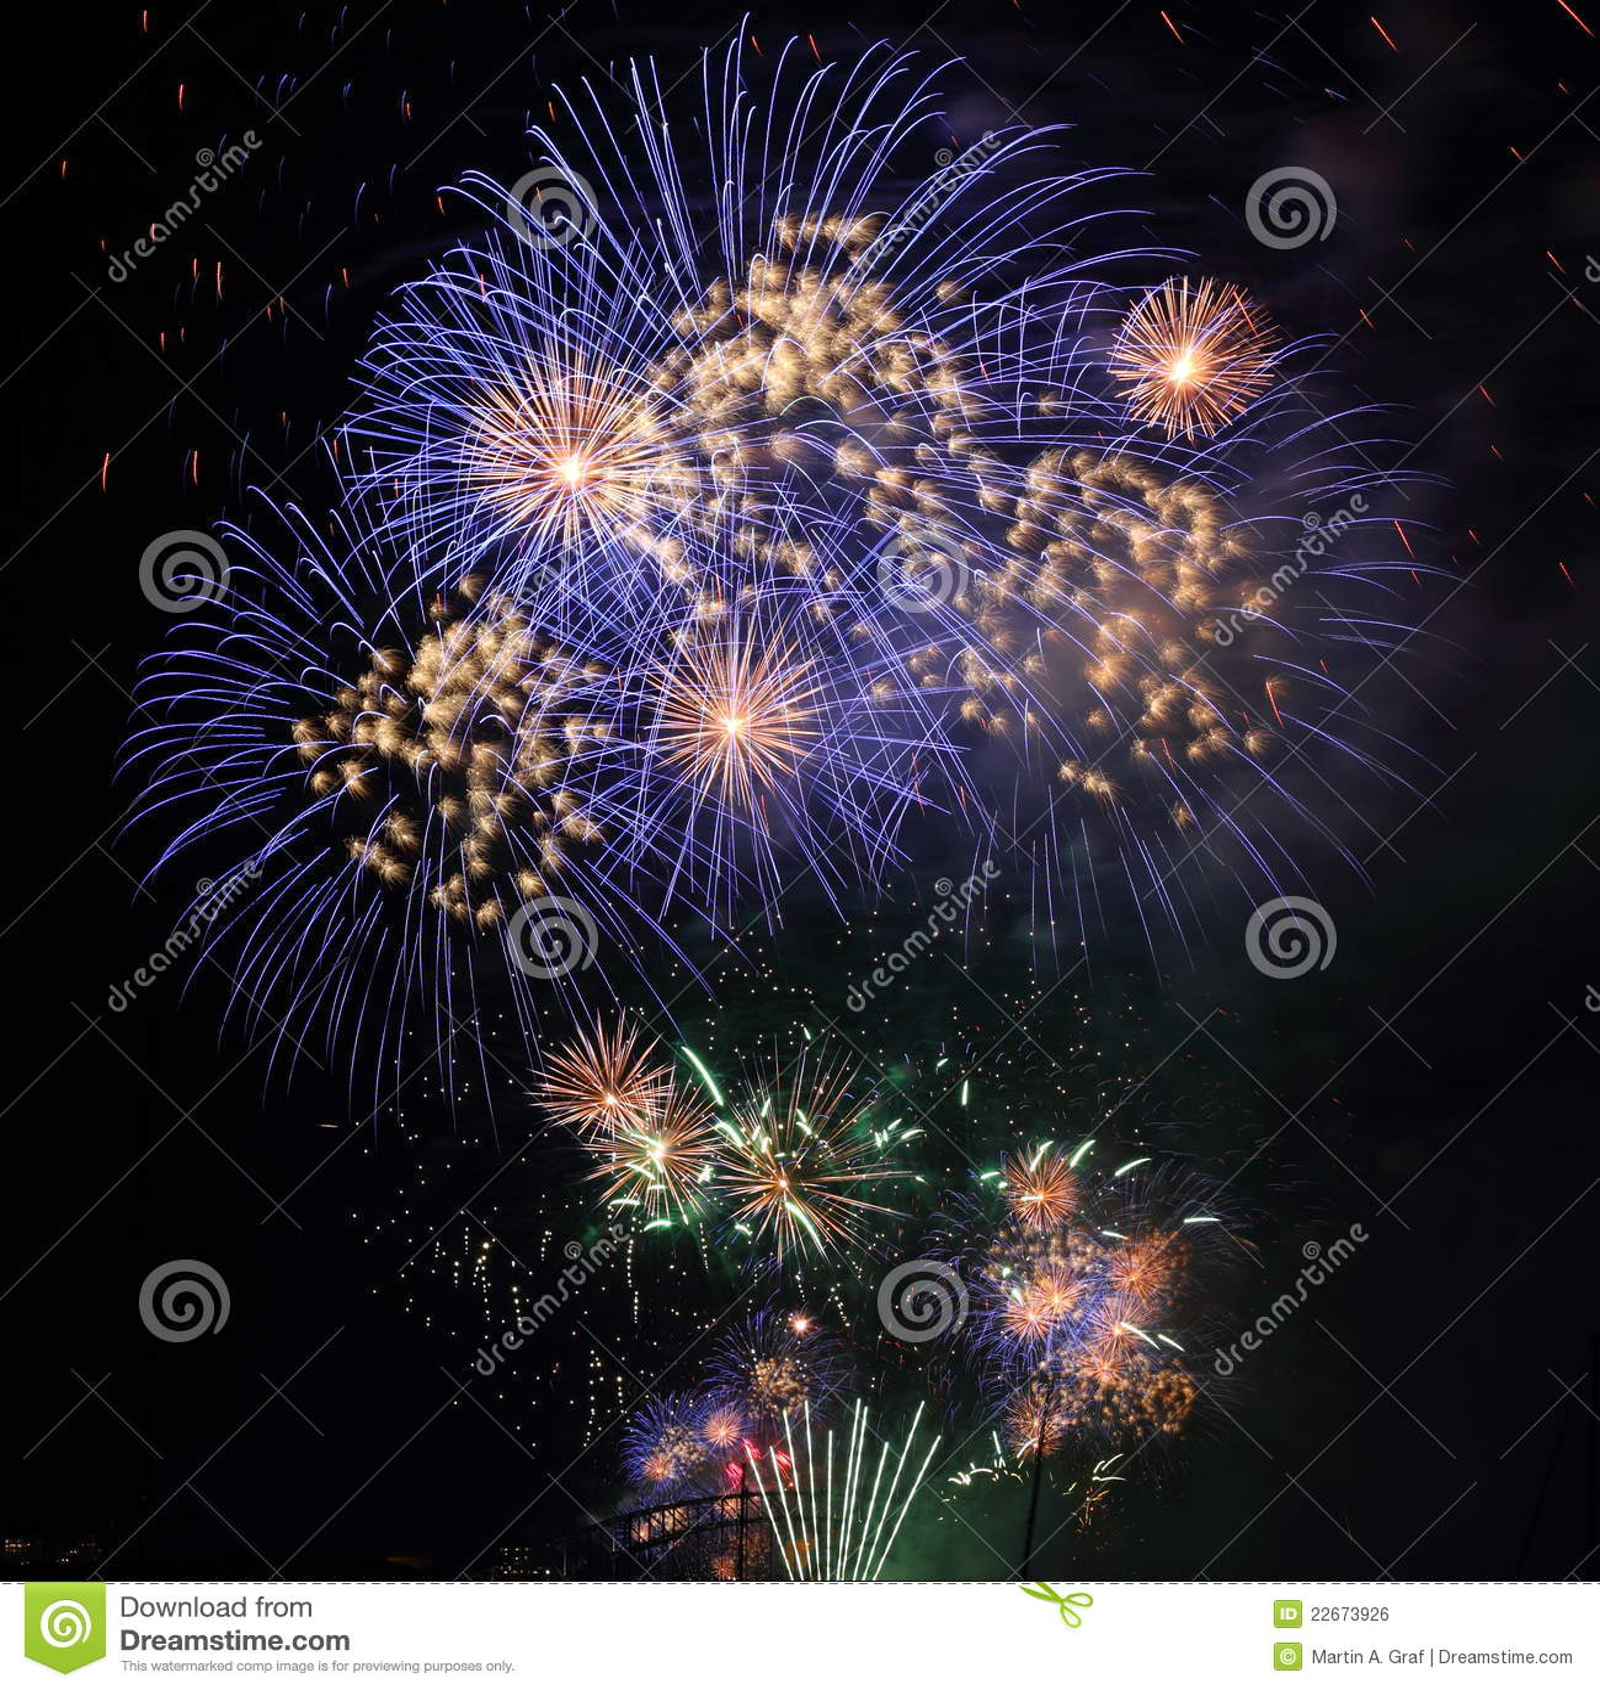 Fireworks blue white in night sky